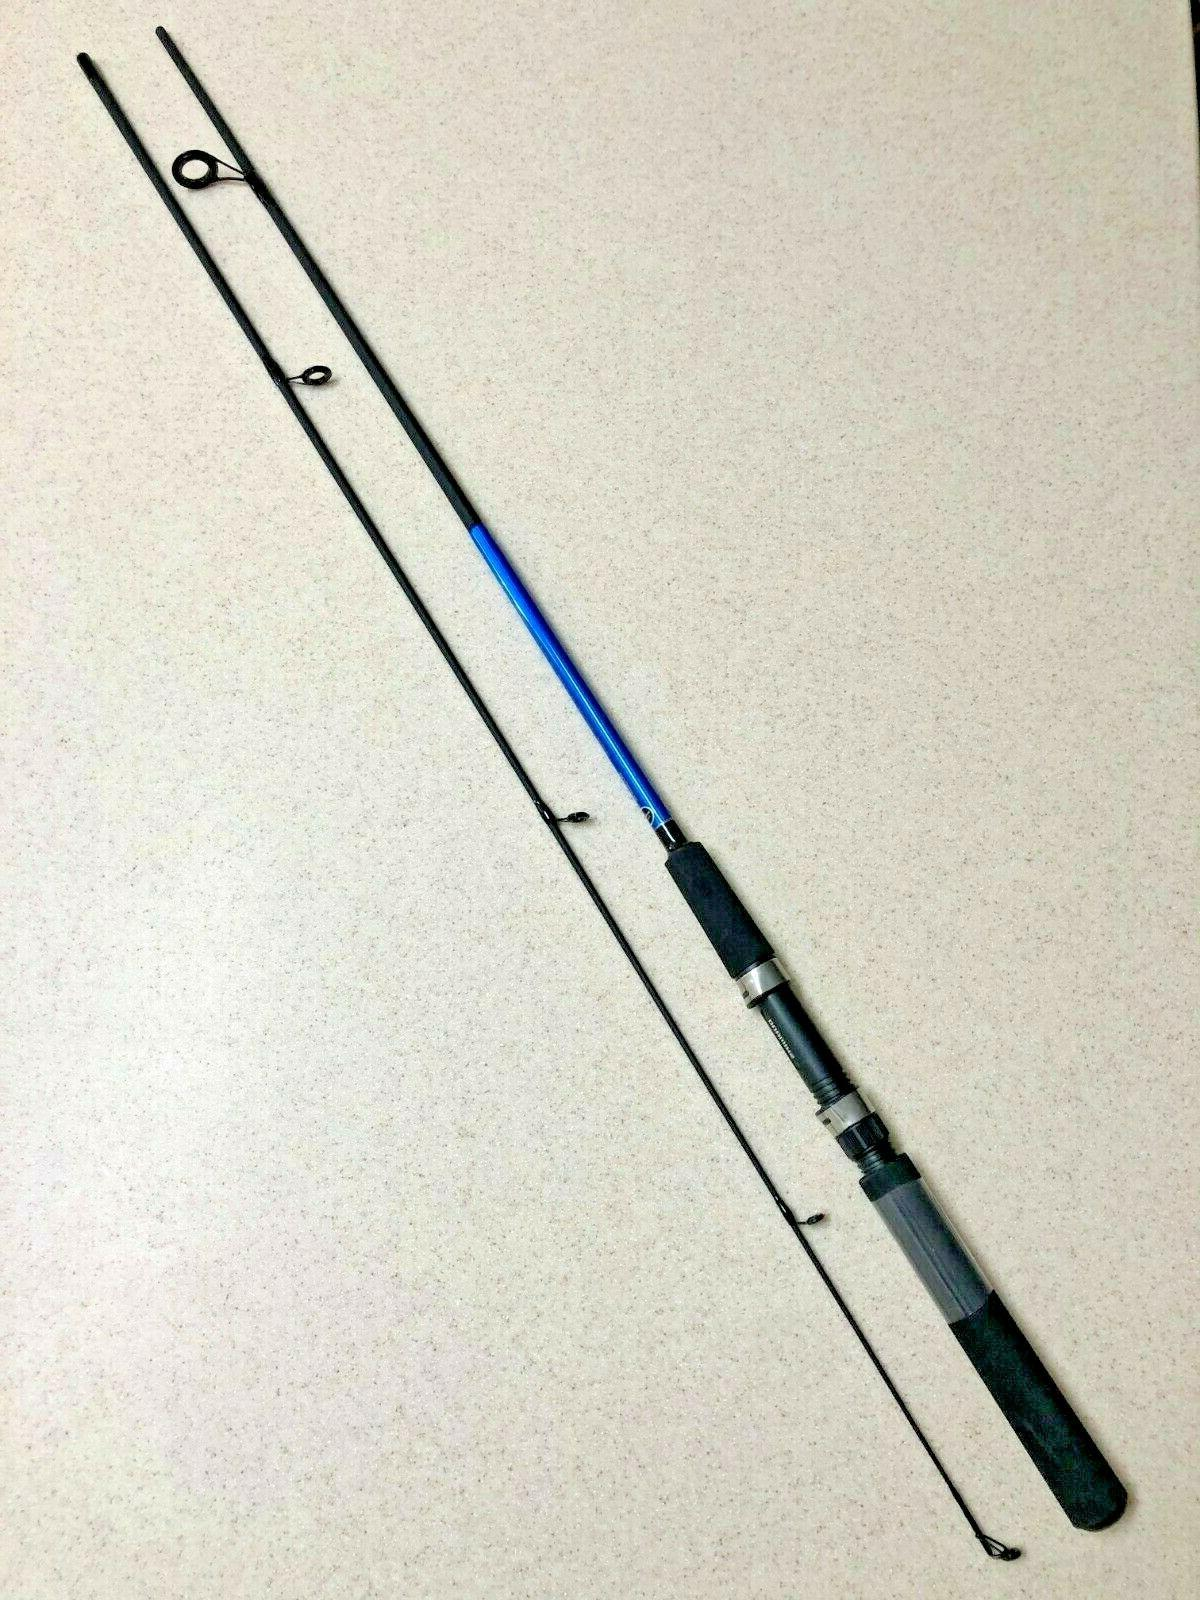 cbs60m2 medium fast 6 spinning rod 2pc